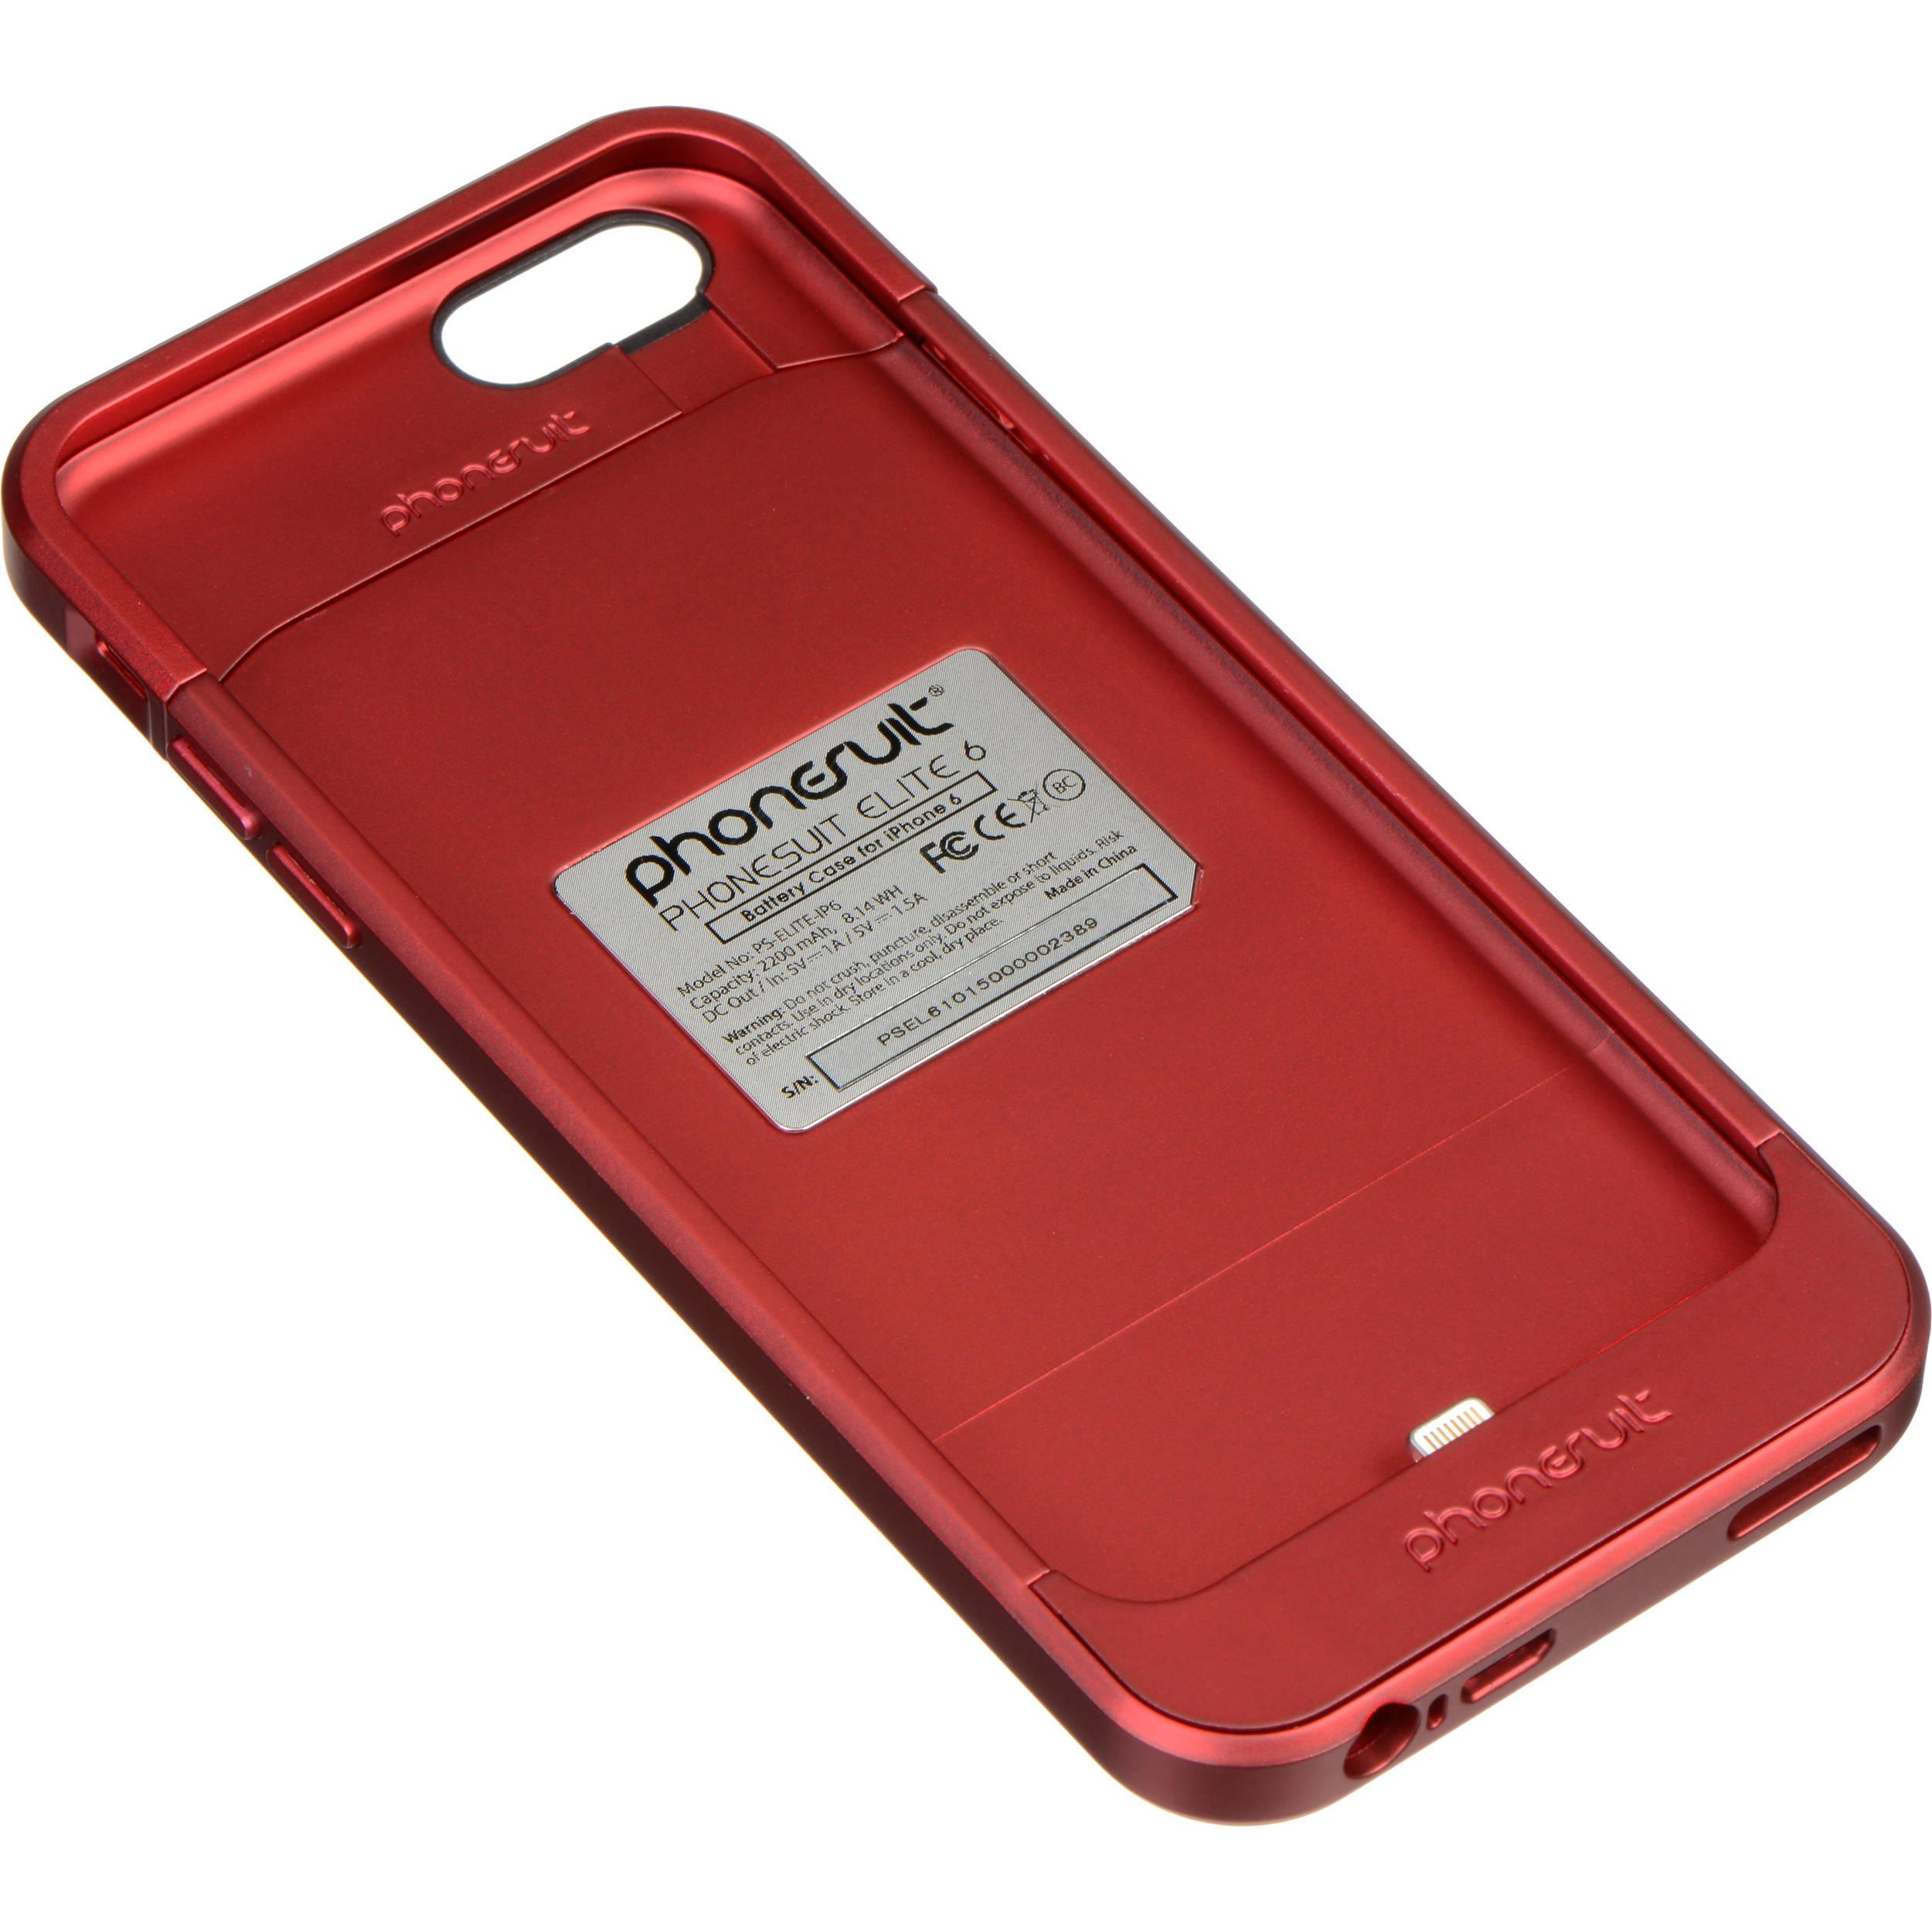 phonesuit elite 6 battery case for iphone 6 ps elite ip6 red b h. Black Bedroom Furniture Sets. Home Design Ideas